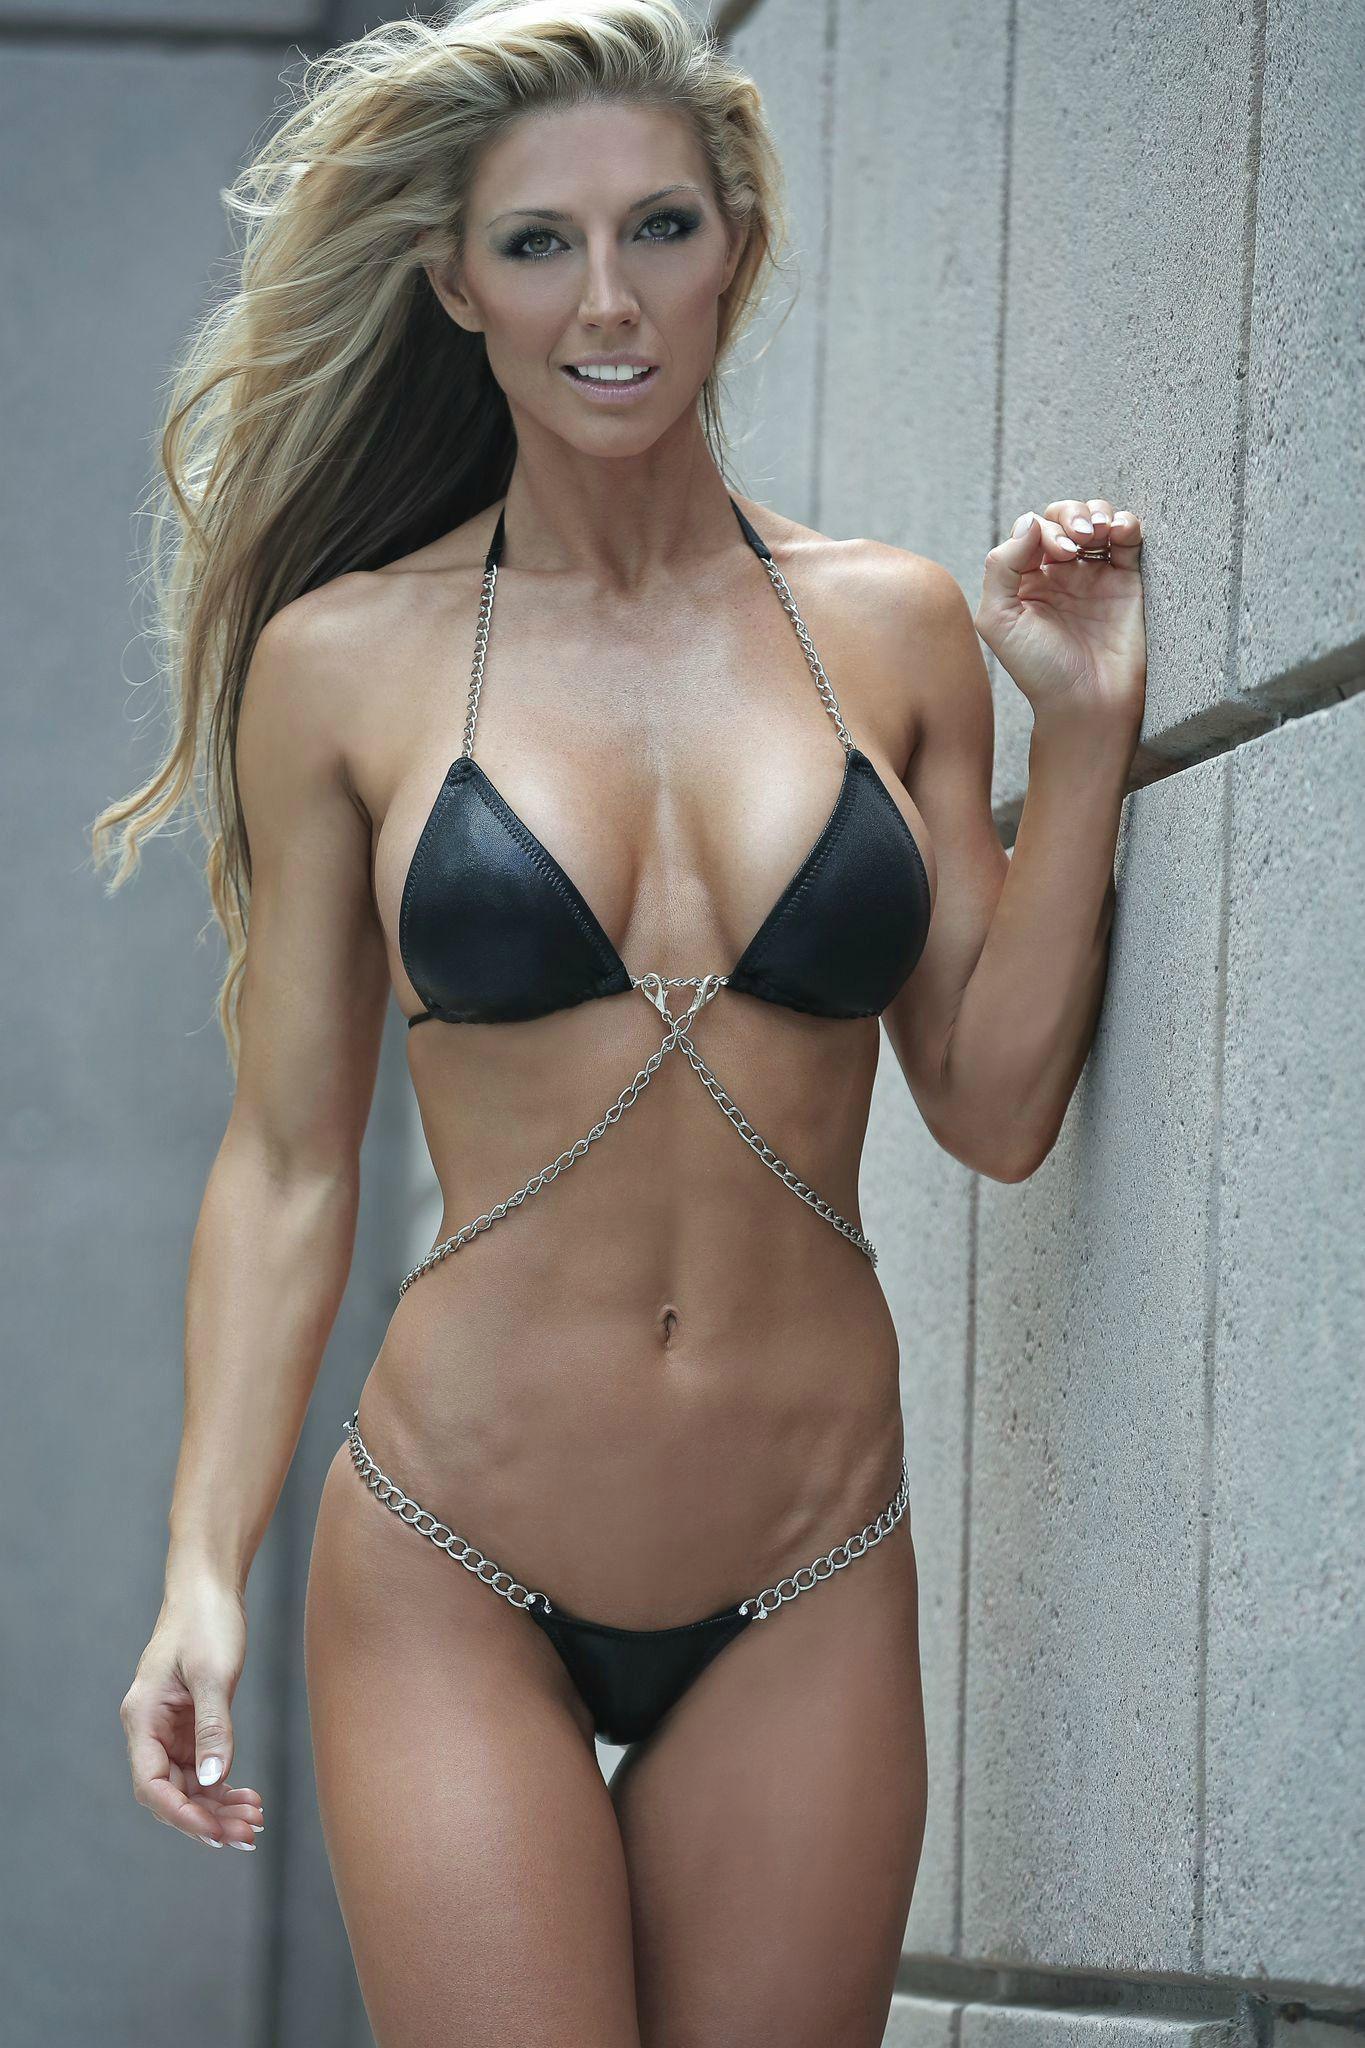 13e573e1ff Callie Bundy - in a bikini. - Imgur